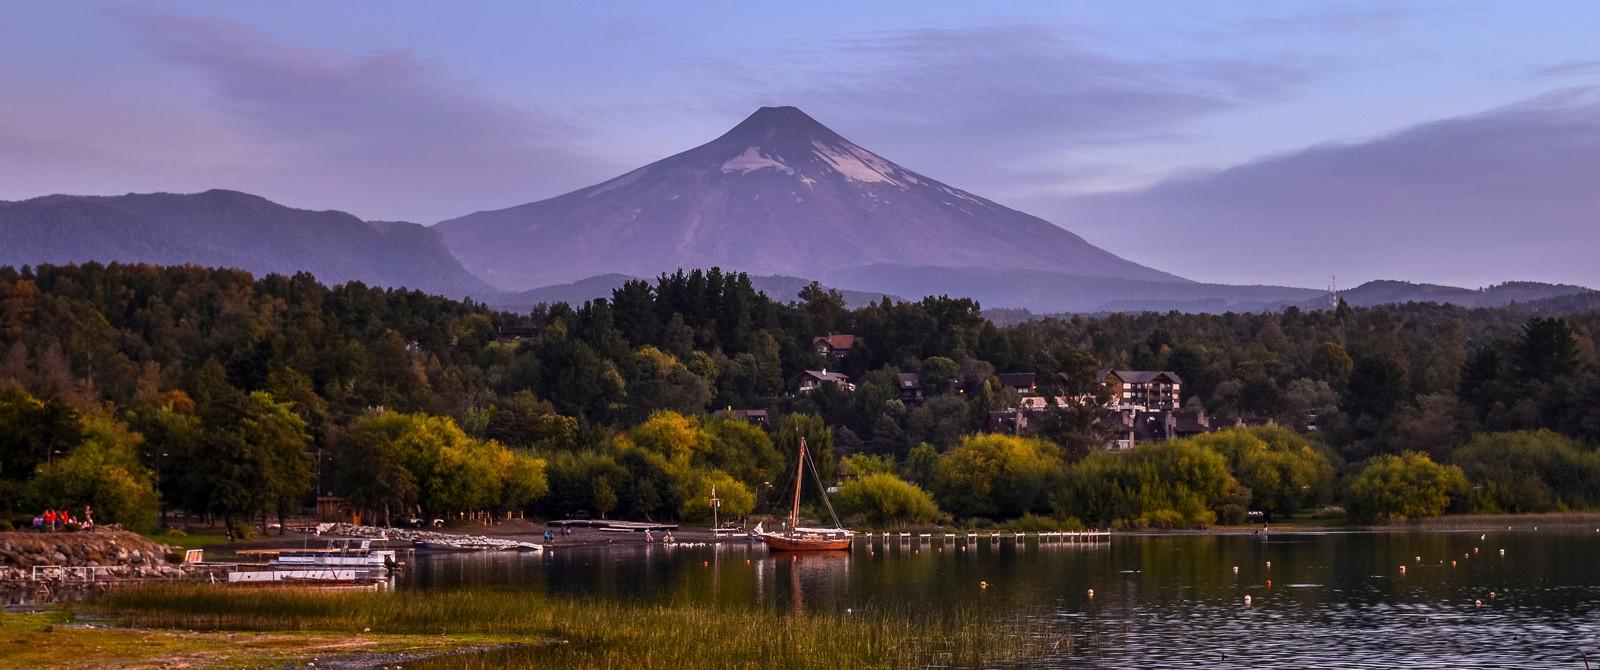 Trek Travel Chile Lakes and Volcano Bike Tour